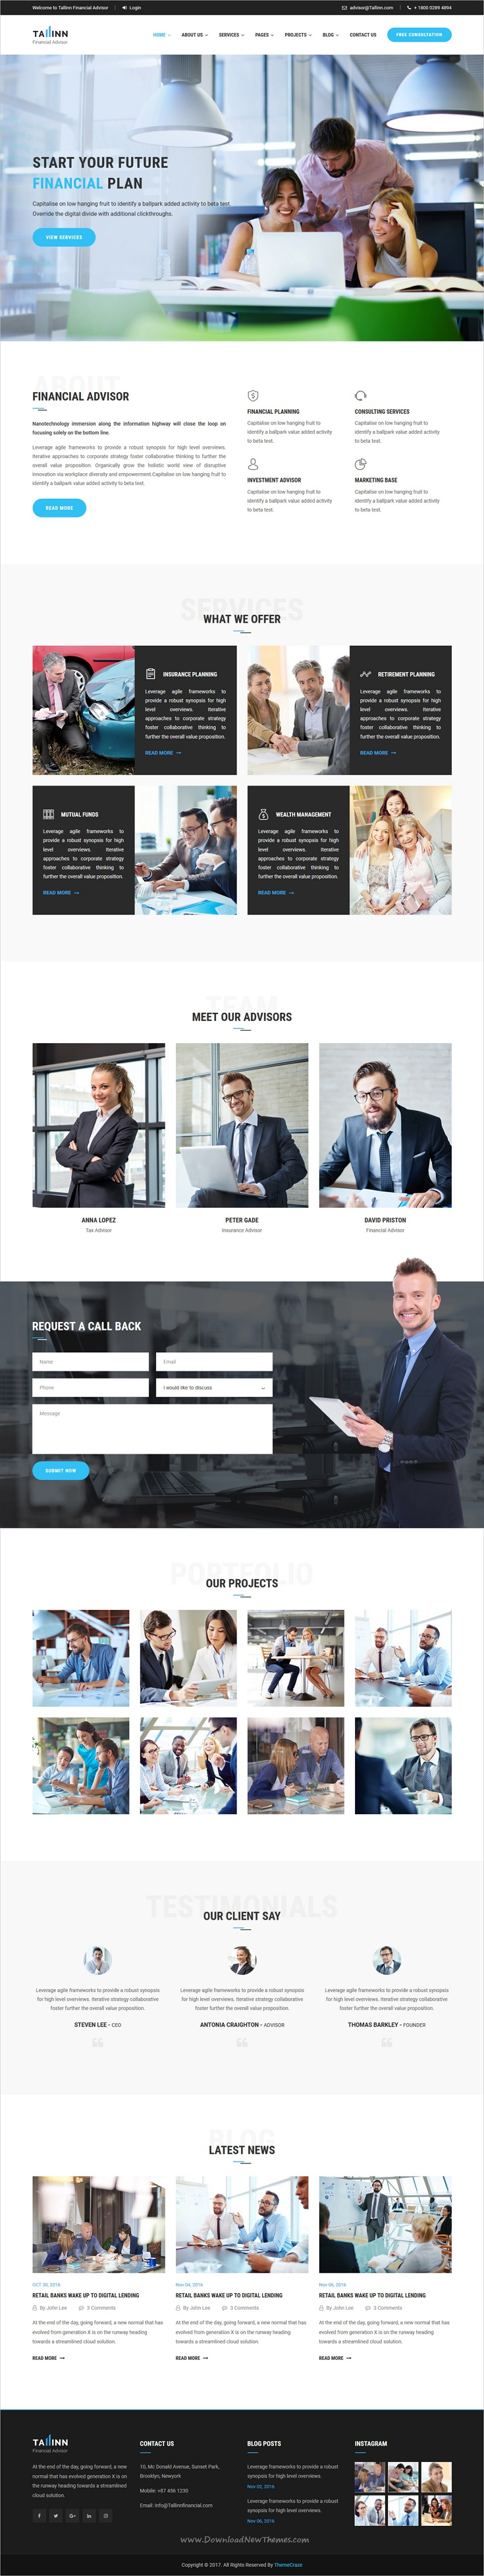 Business Finance and Consultancy HTML Template - Tallinn | Html ...